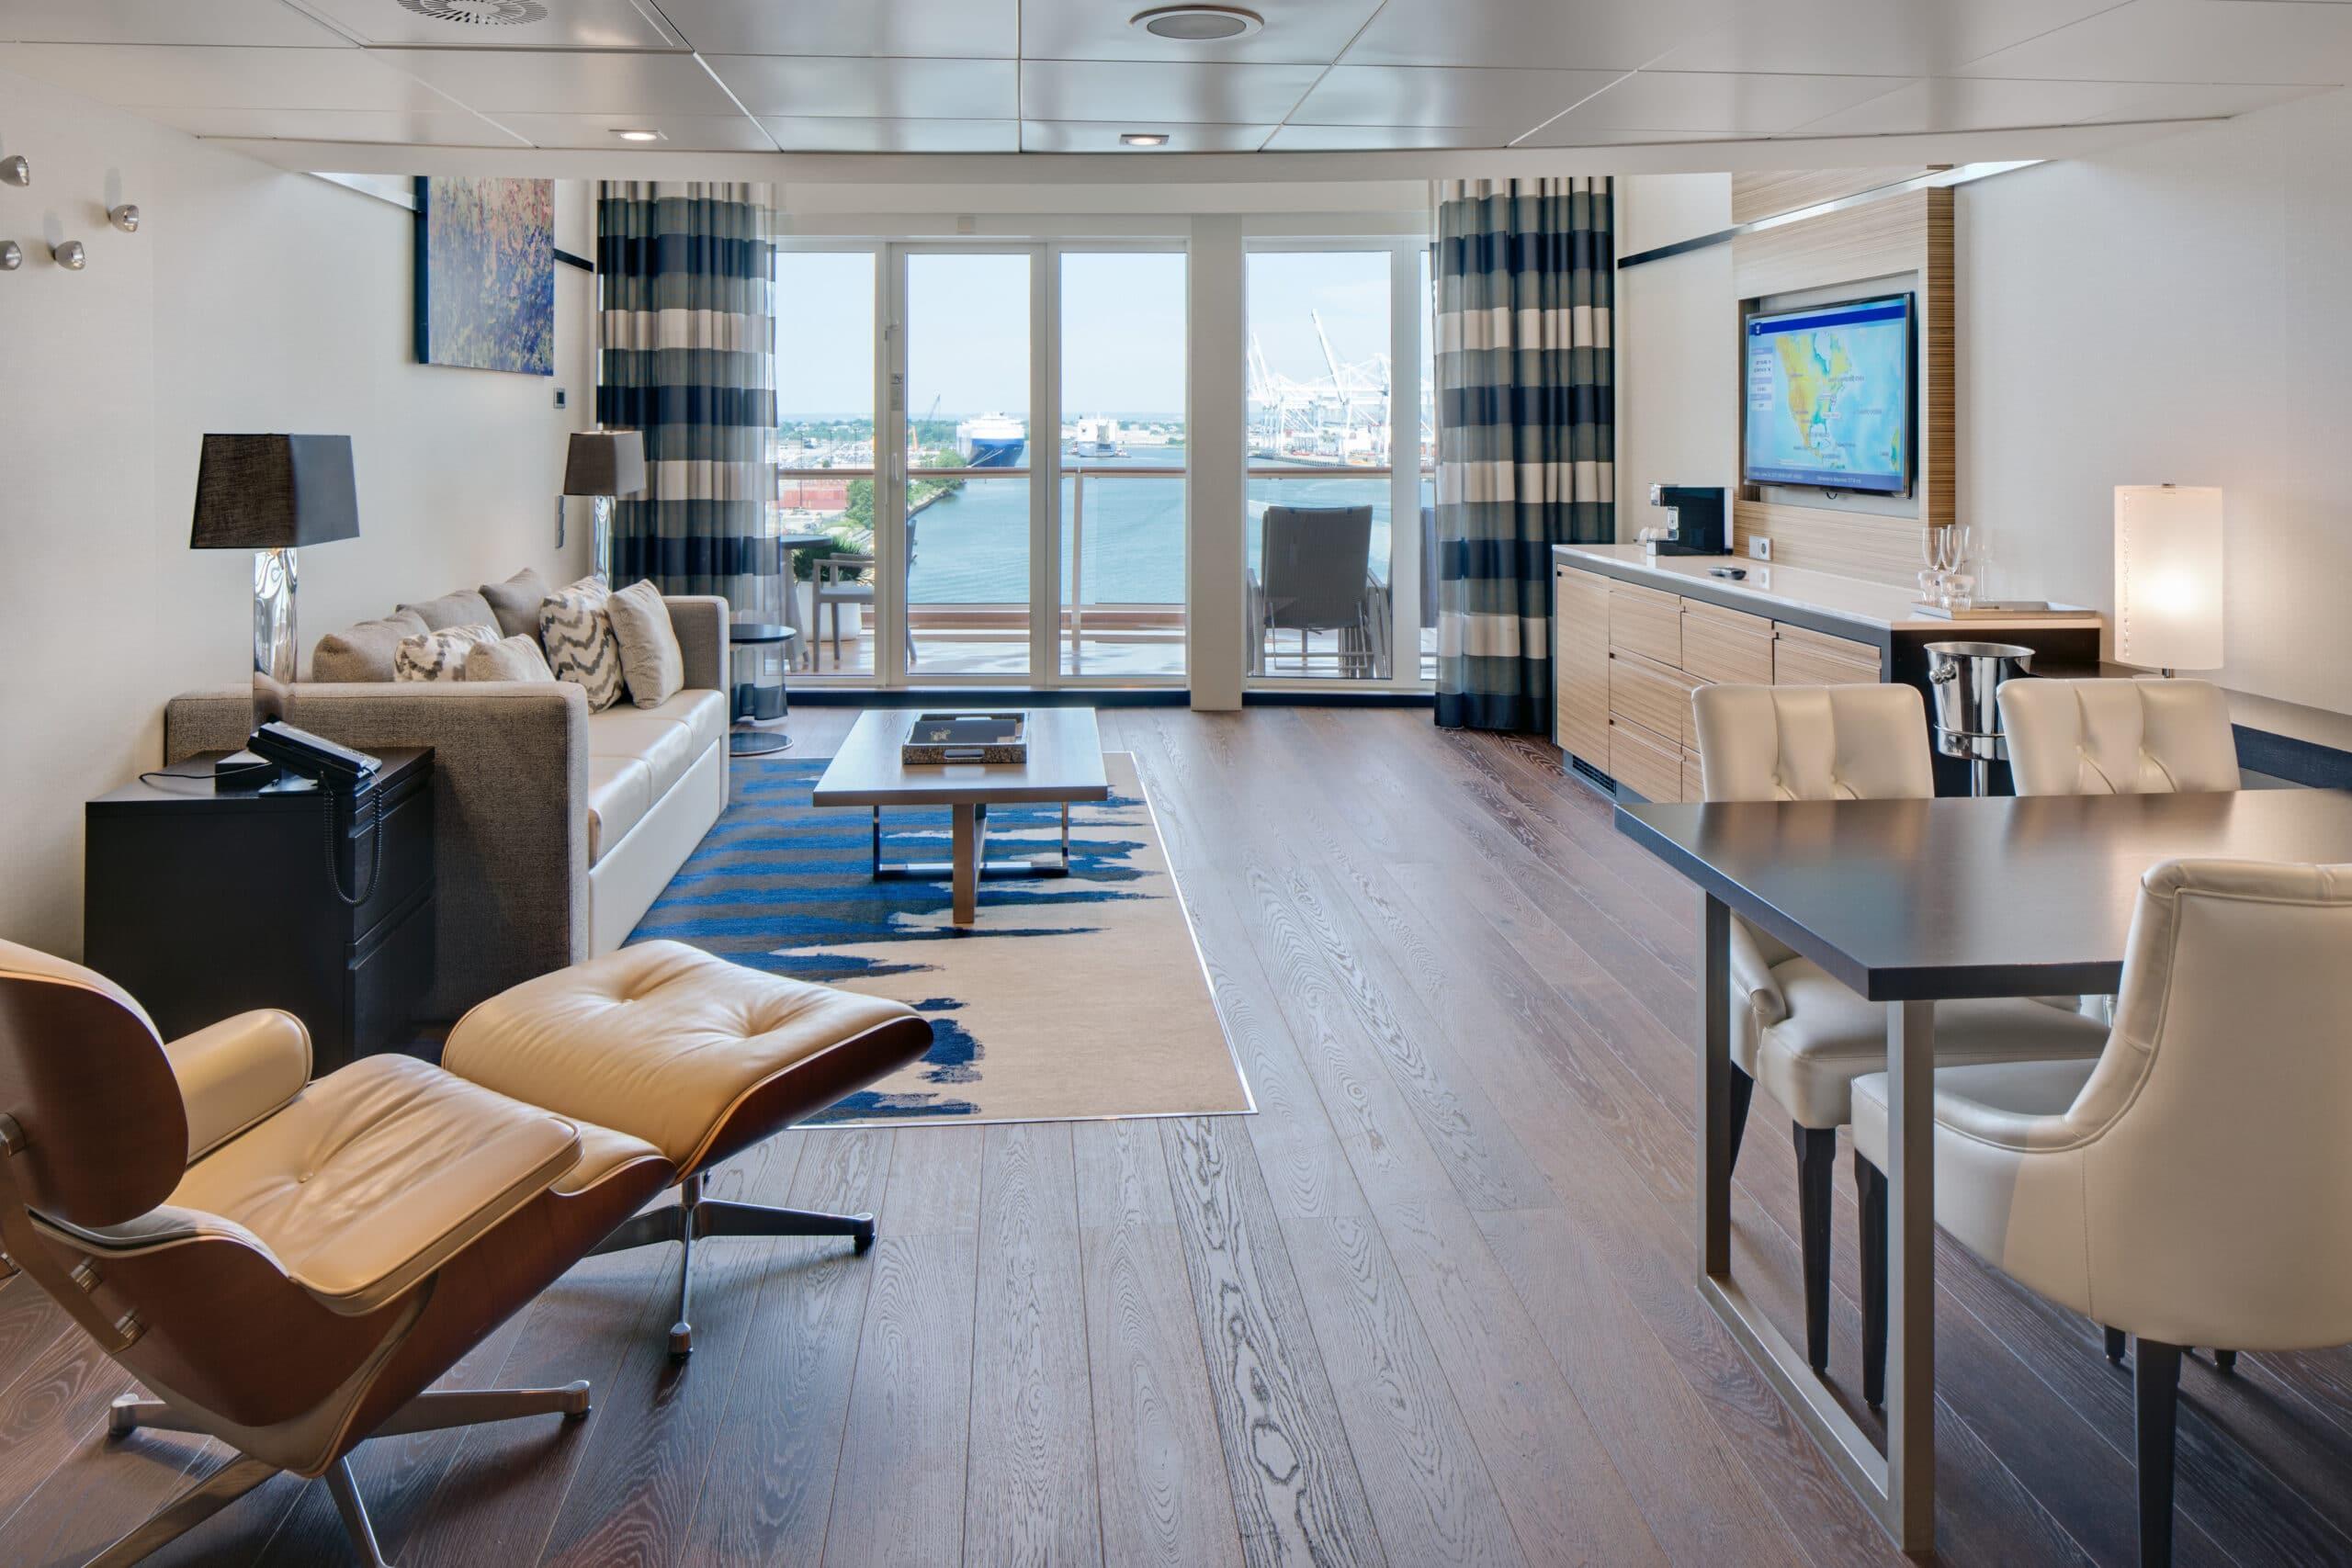 Royal-Caribbean-International-Anthem-Quantum-Ovation-Oddysey-of-the-seas-schip-cruiseschip-categorie-GL-Grand-Loft-Suite